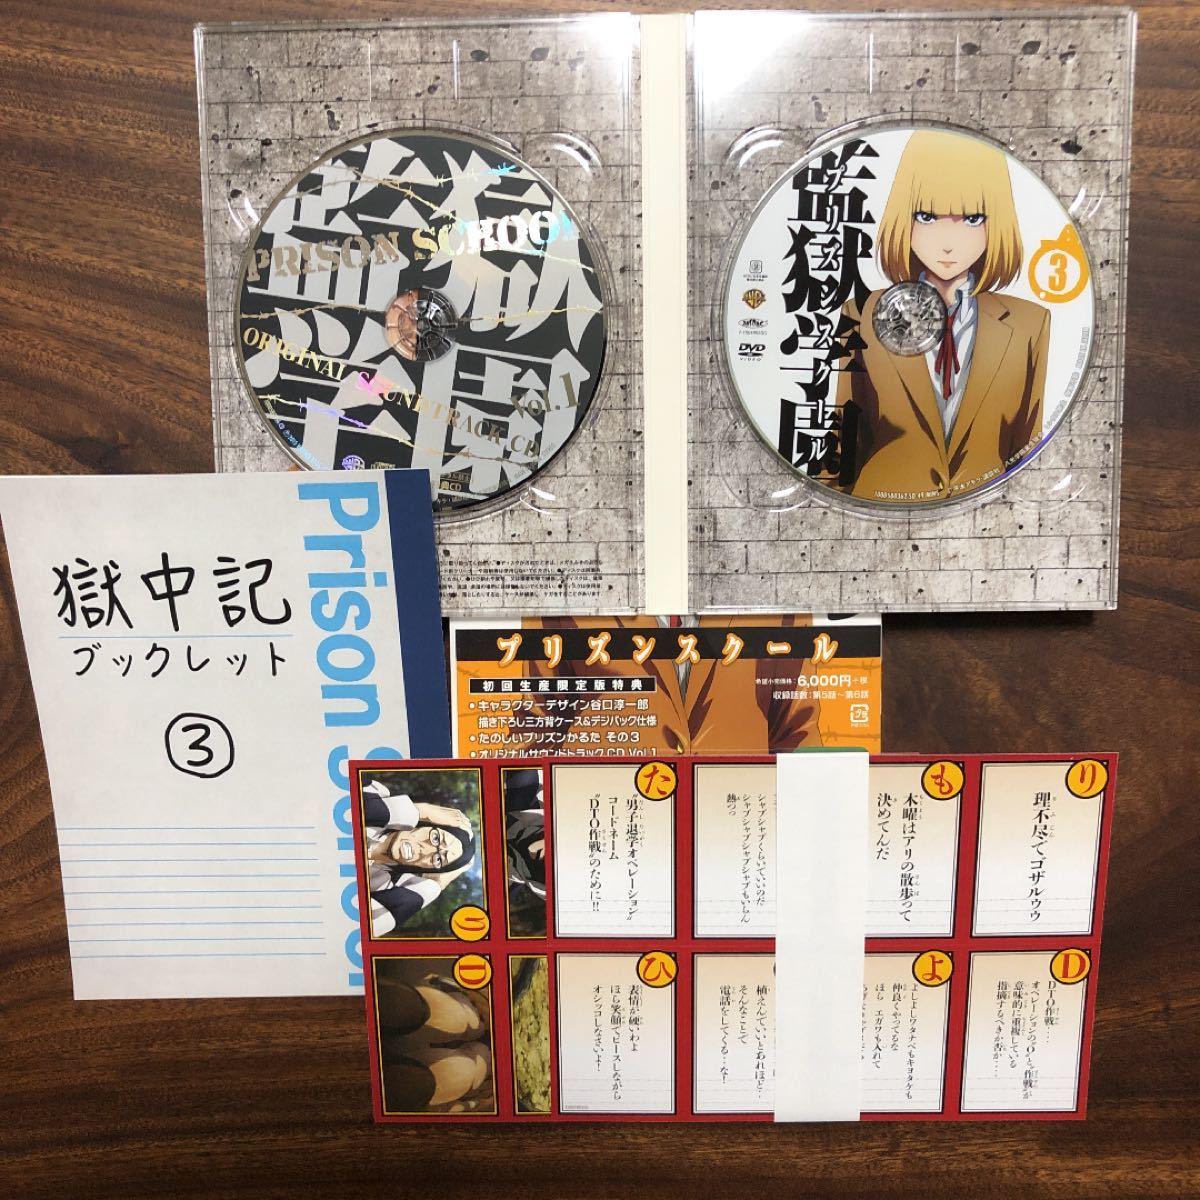 DVD 「監獄学園」 第3巻 初回生産限定版 [ワーナーブラザース]